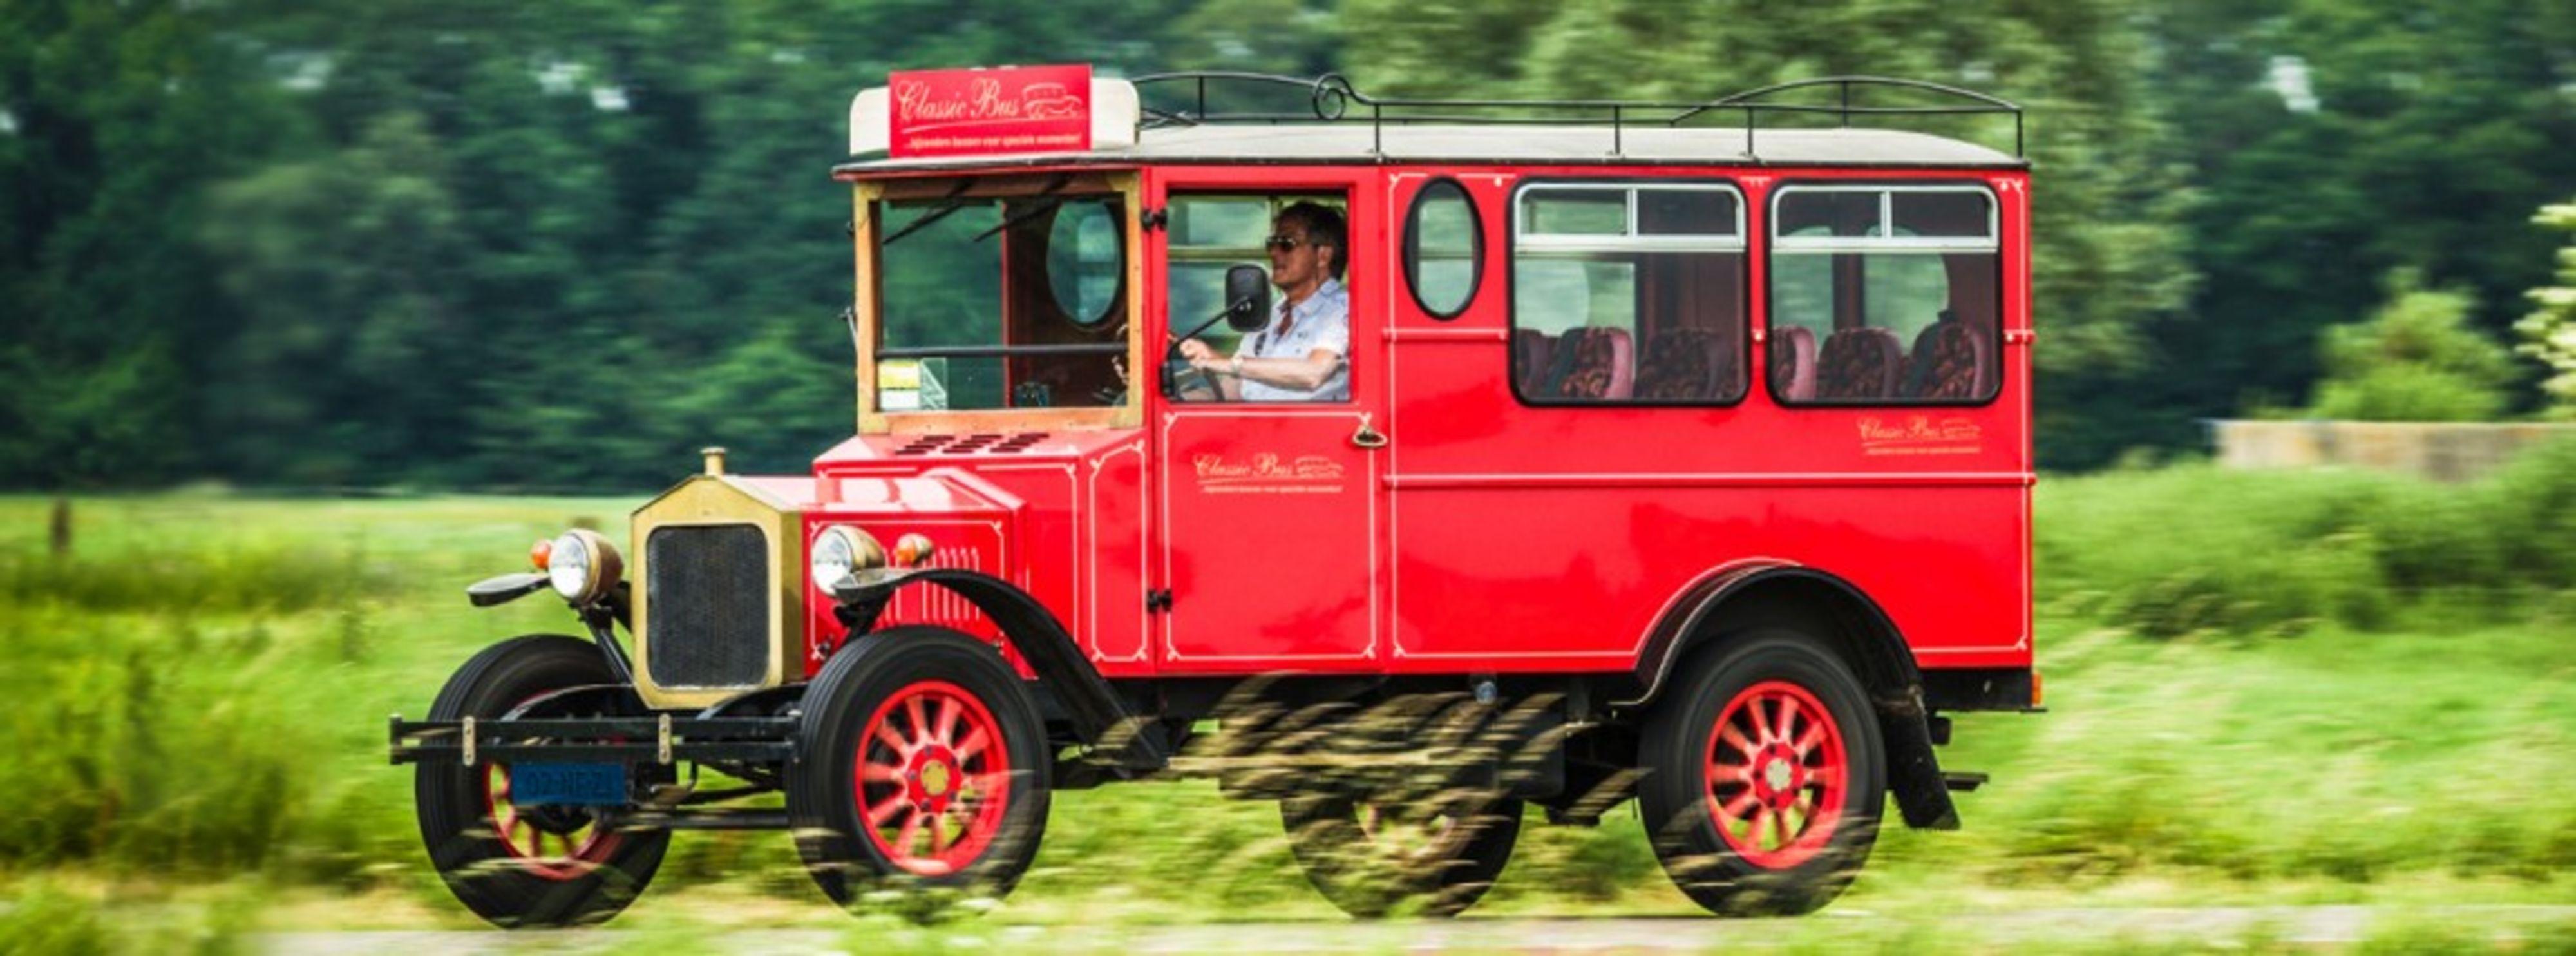 Classicbus trouwvervoer